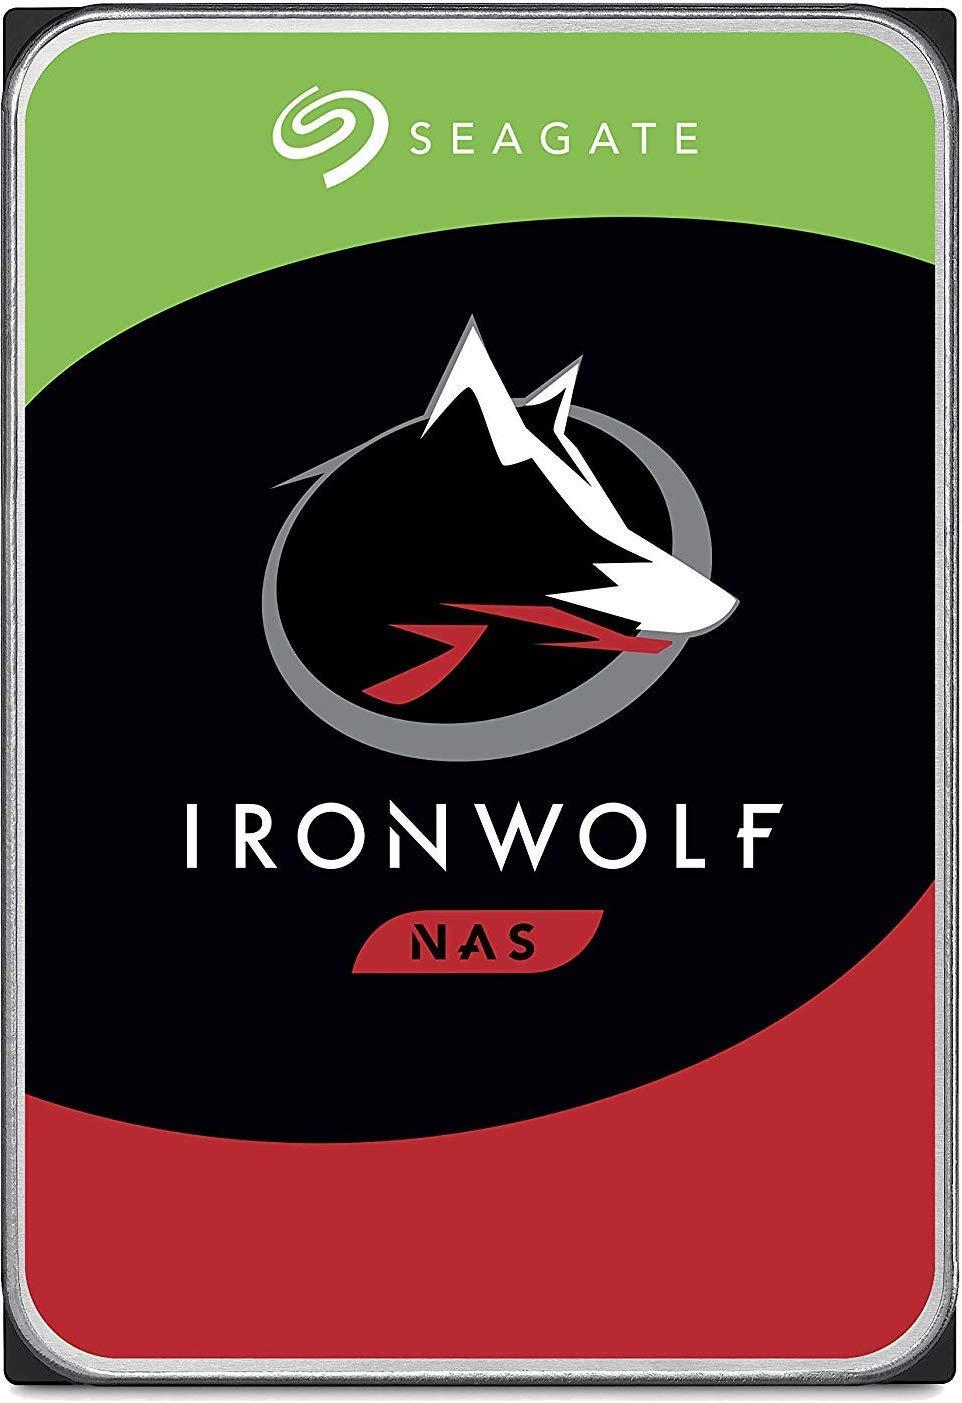 Seagate IronWolf NAS 4TB